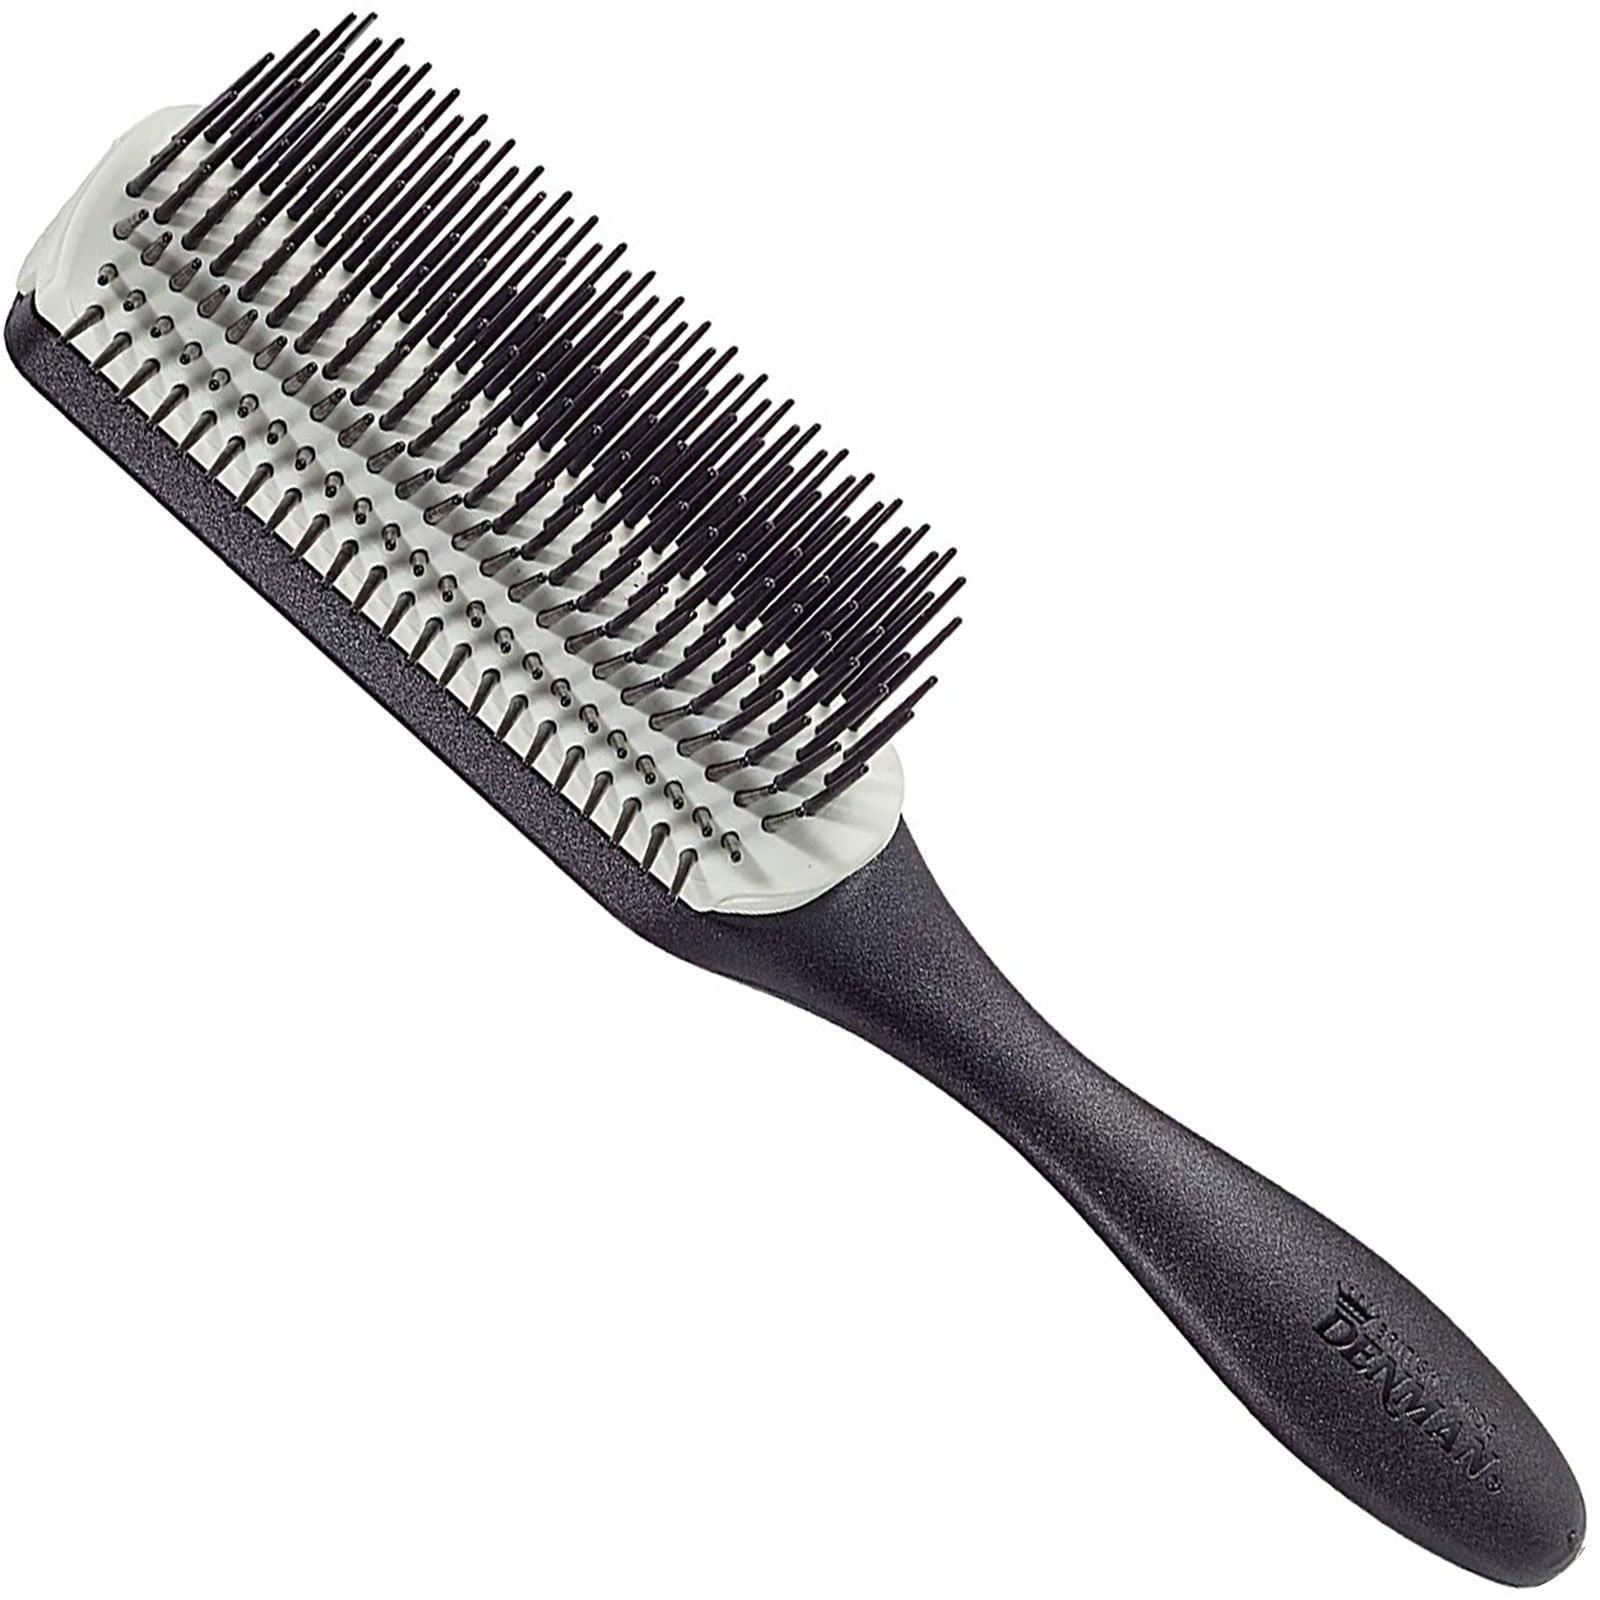 Denman - D4N - Large Styling Brush - 9 Rijen